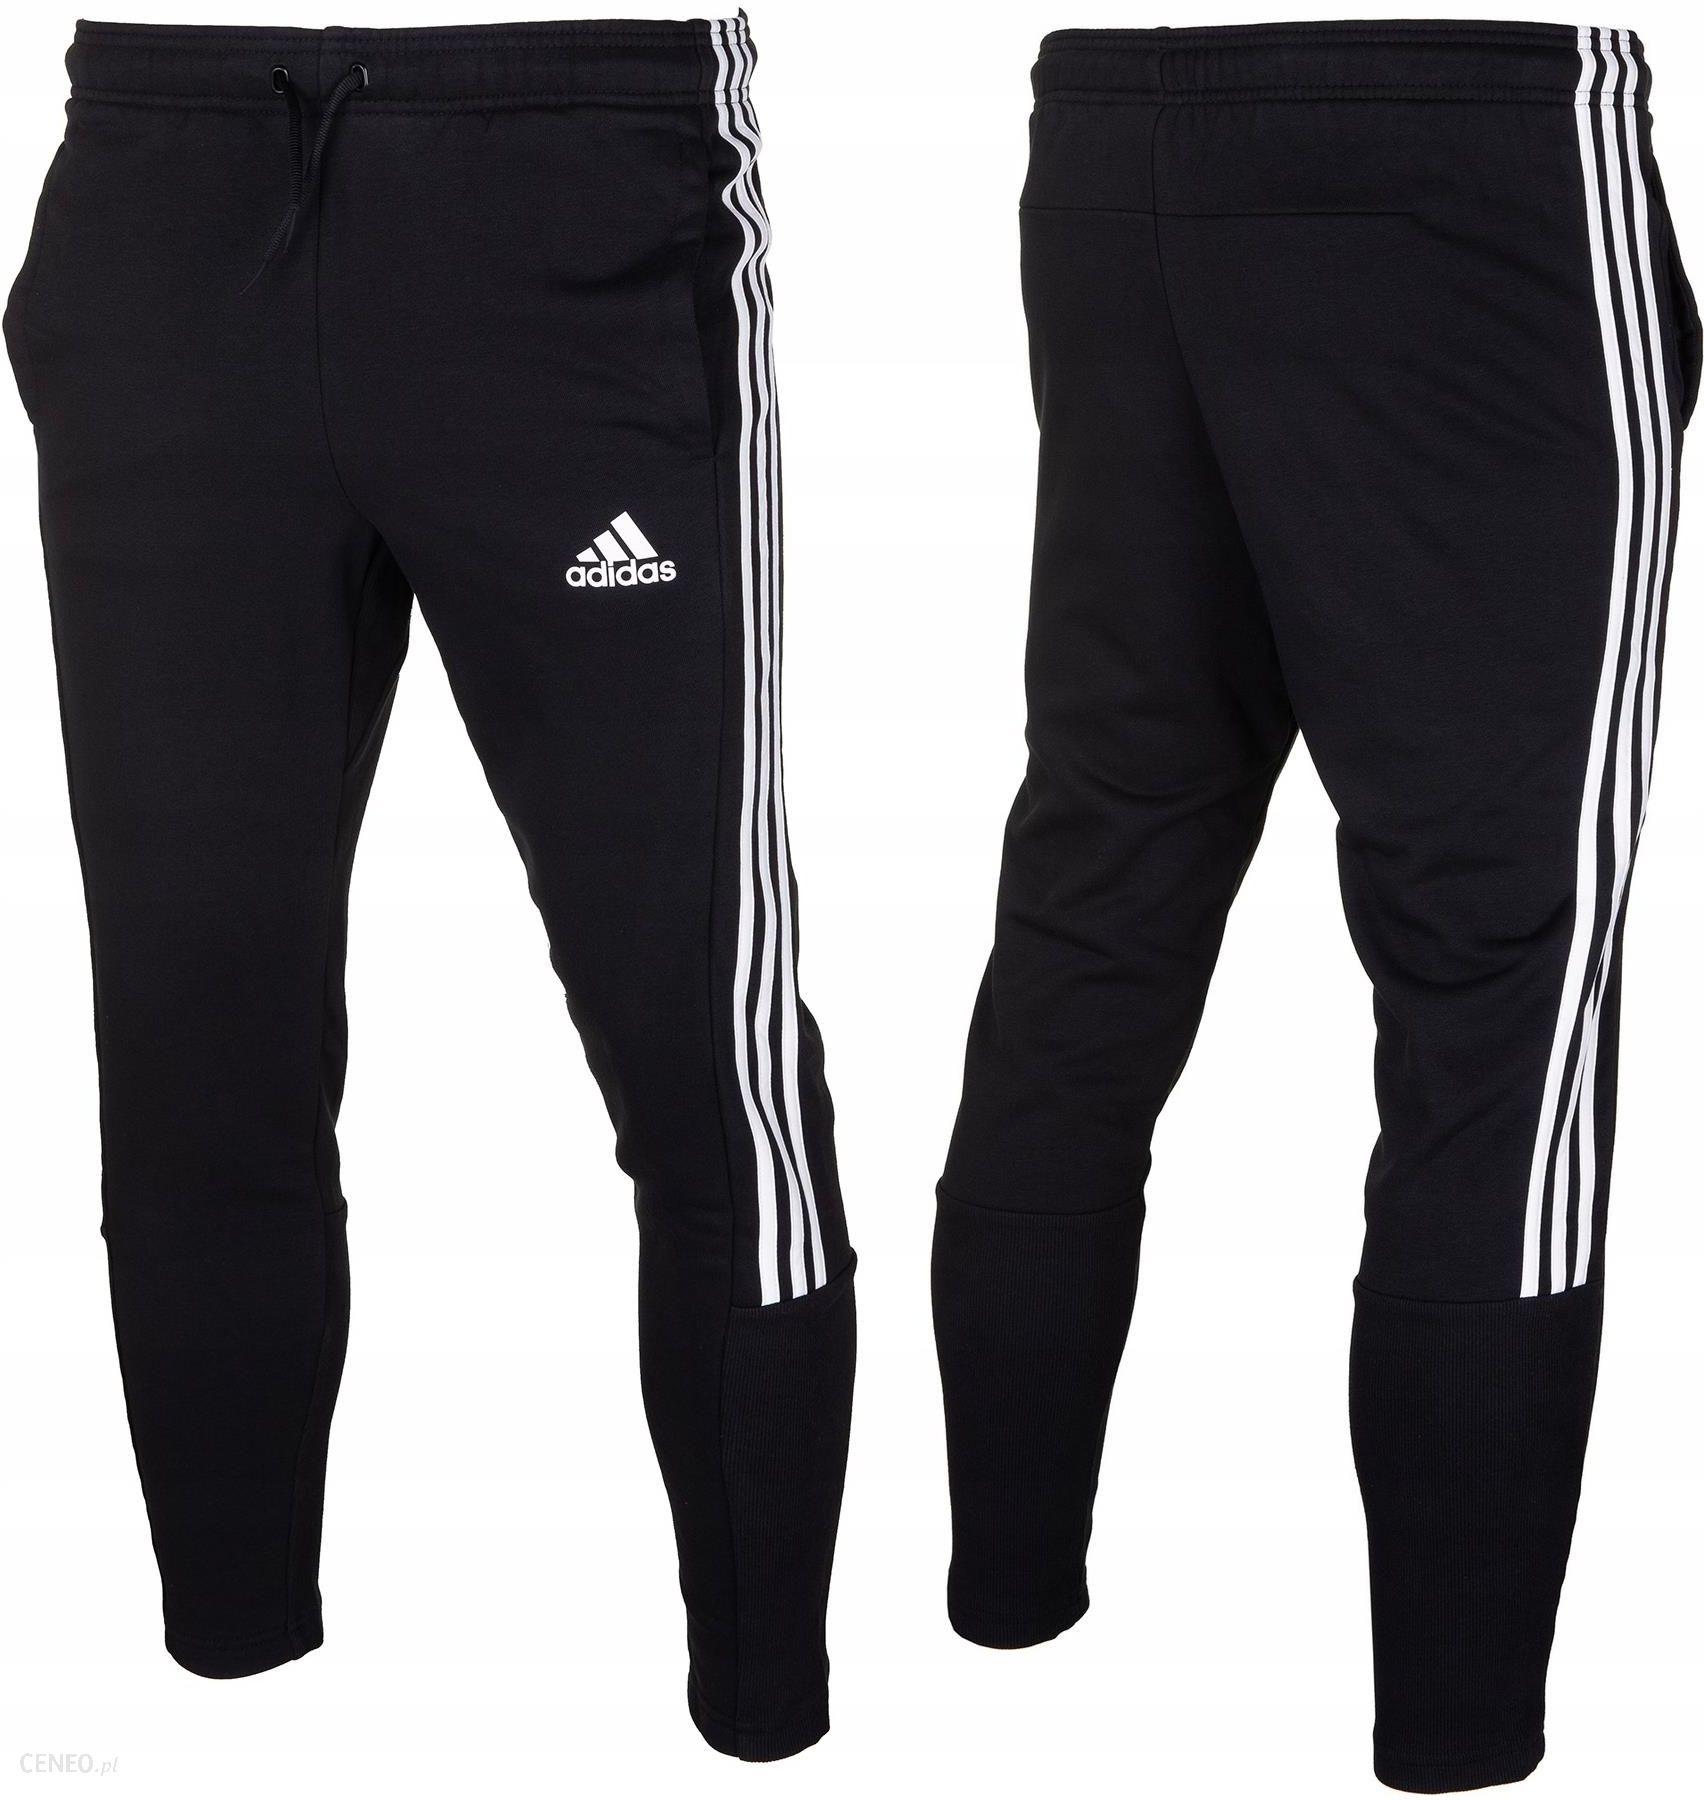 Spodnie Męskie Adidas Originals Trefoil DV1574 r.L